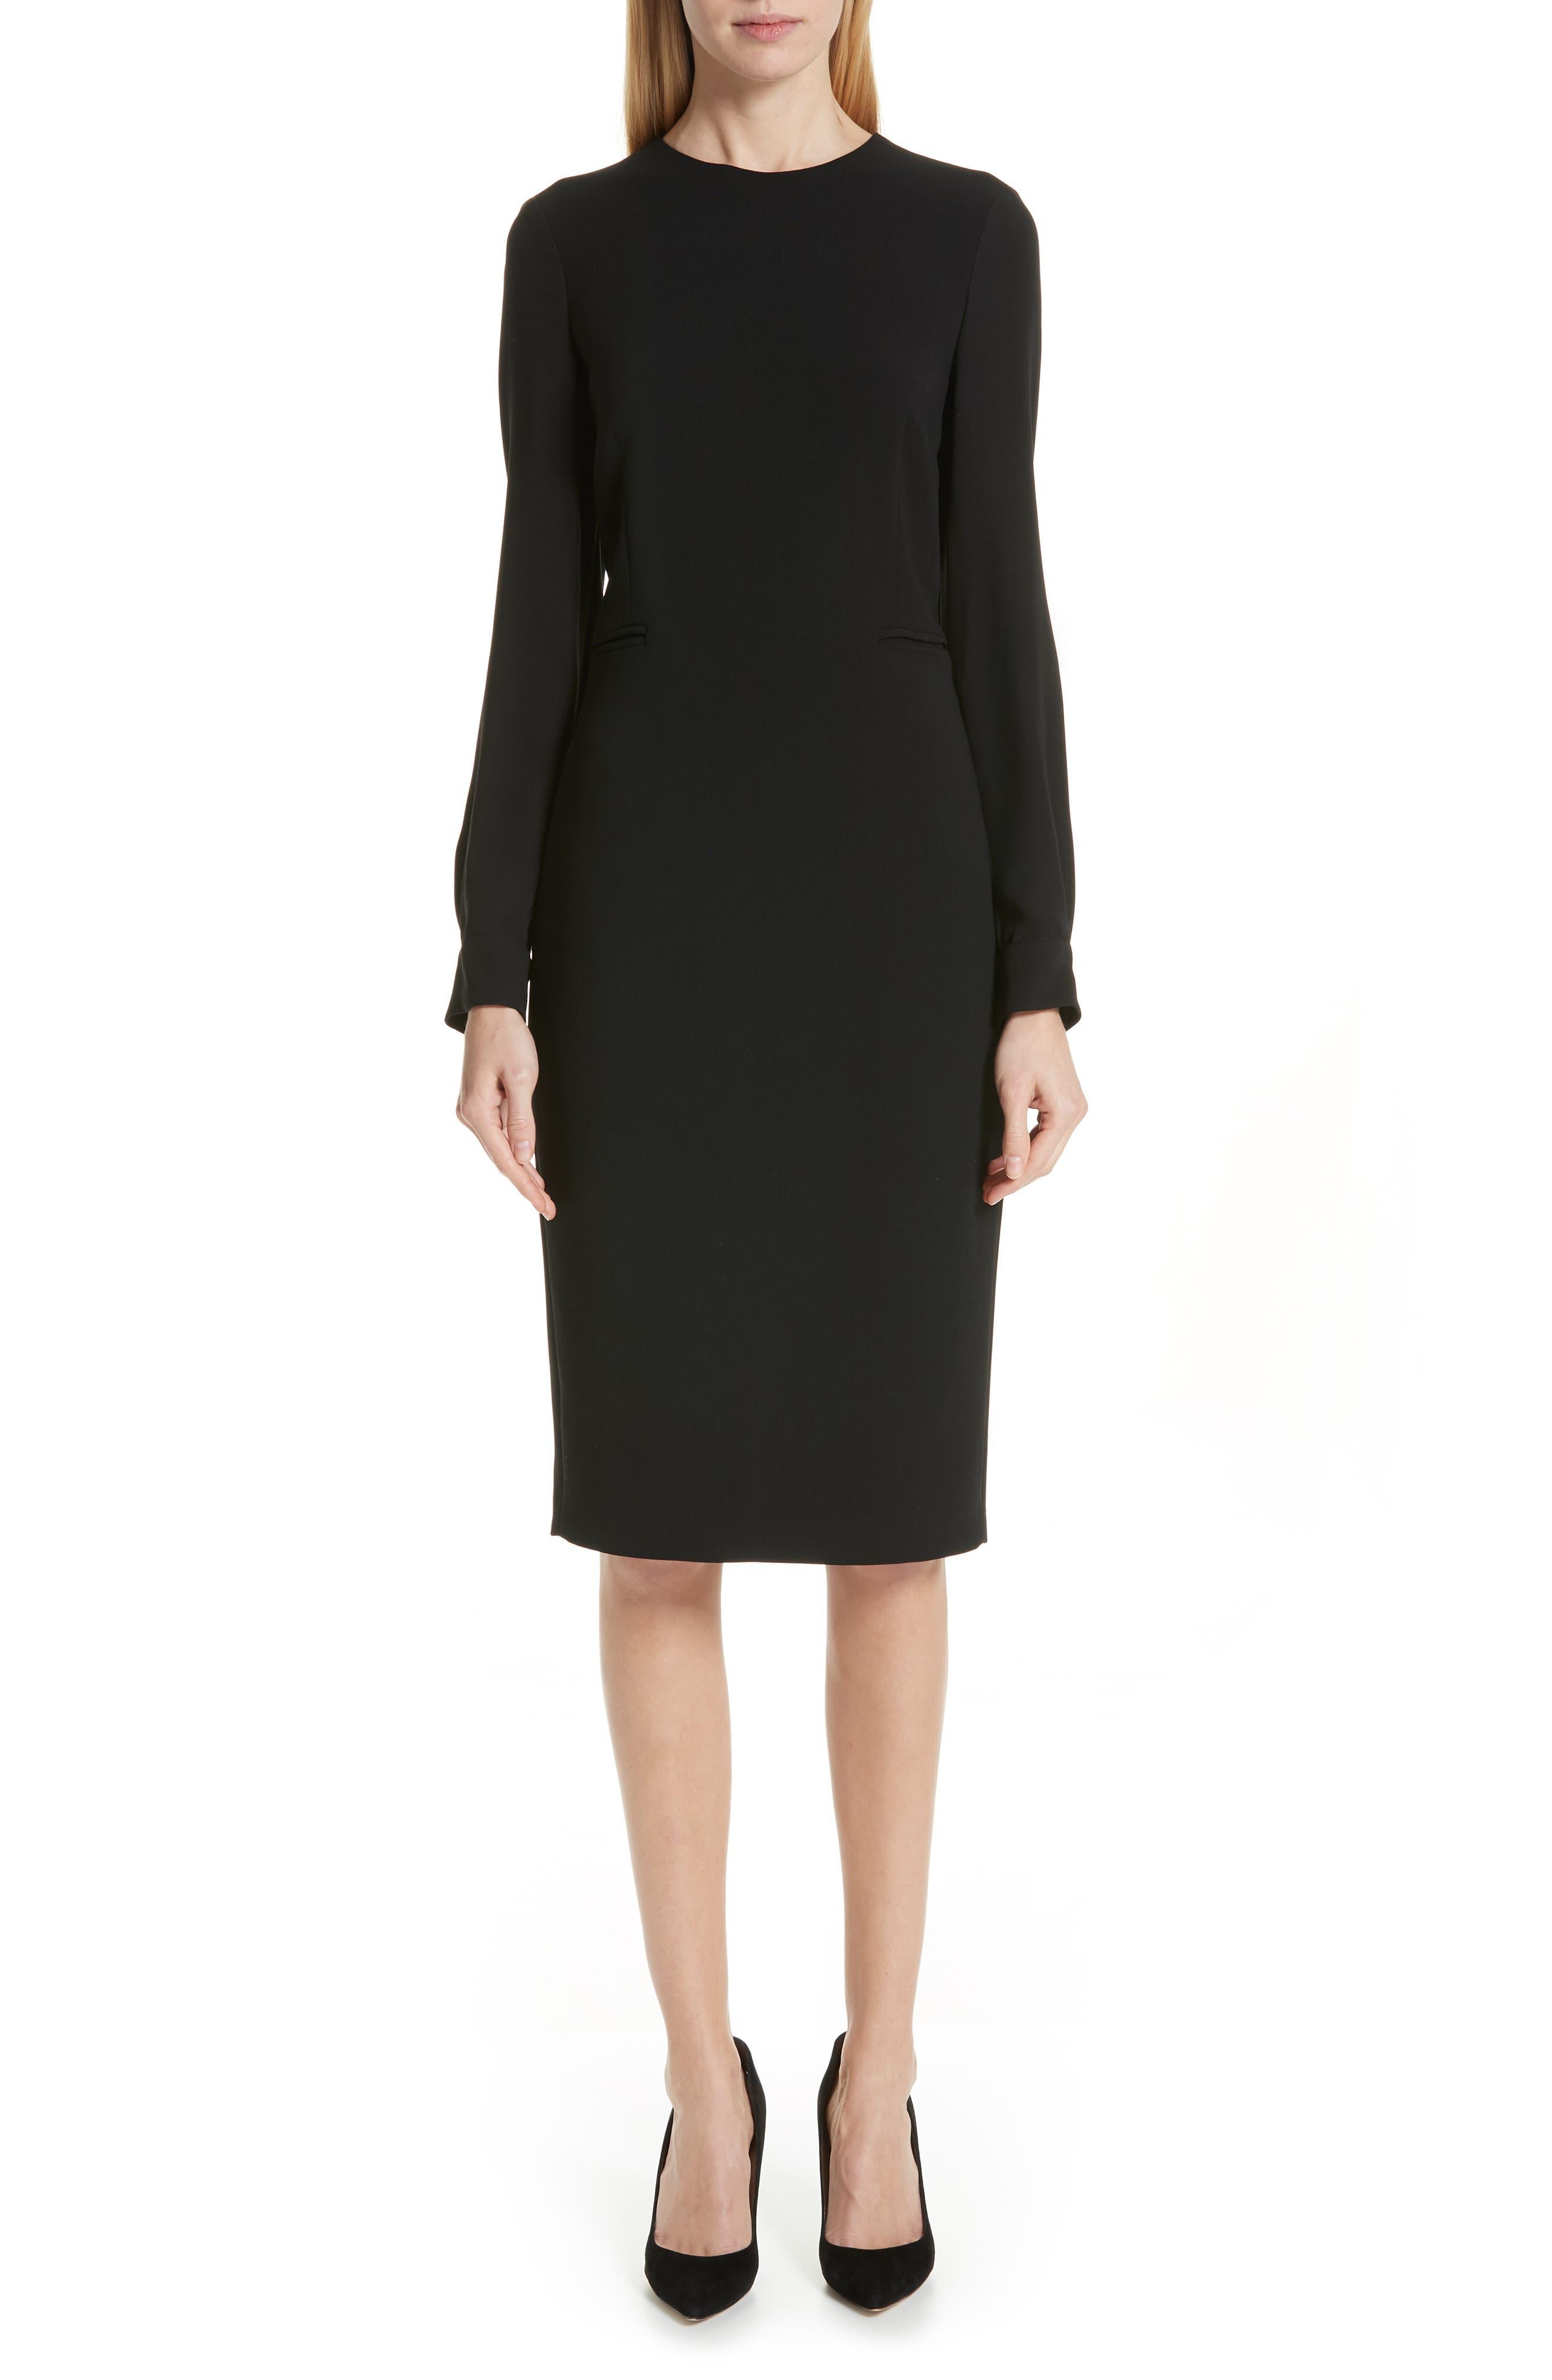 Max Mara Ottelia Stretch Wool Sheath Dress, Black